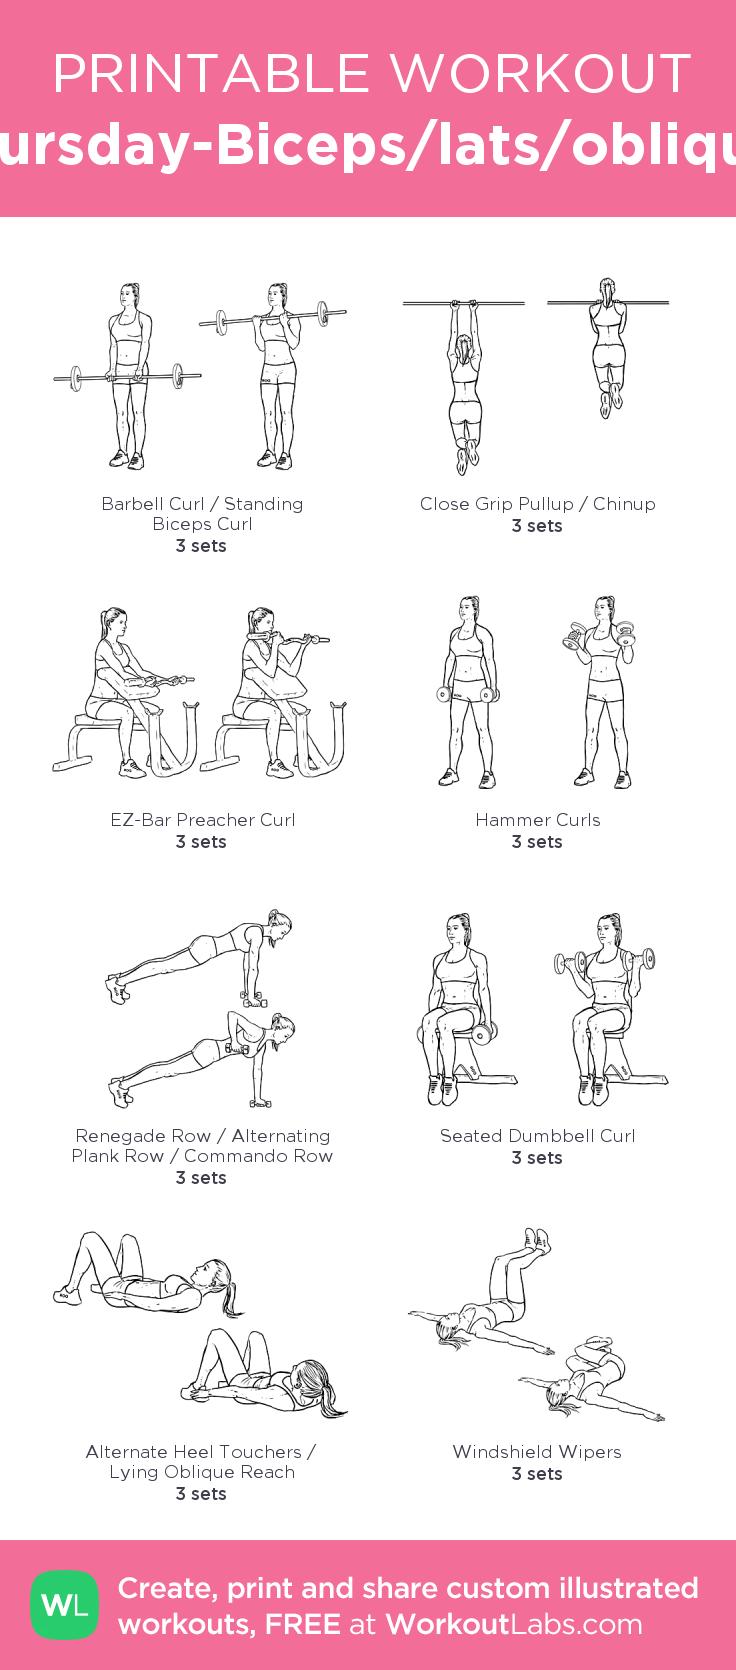 Growtaller4idiots exercises pdf free download